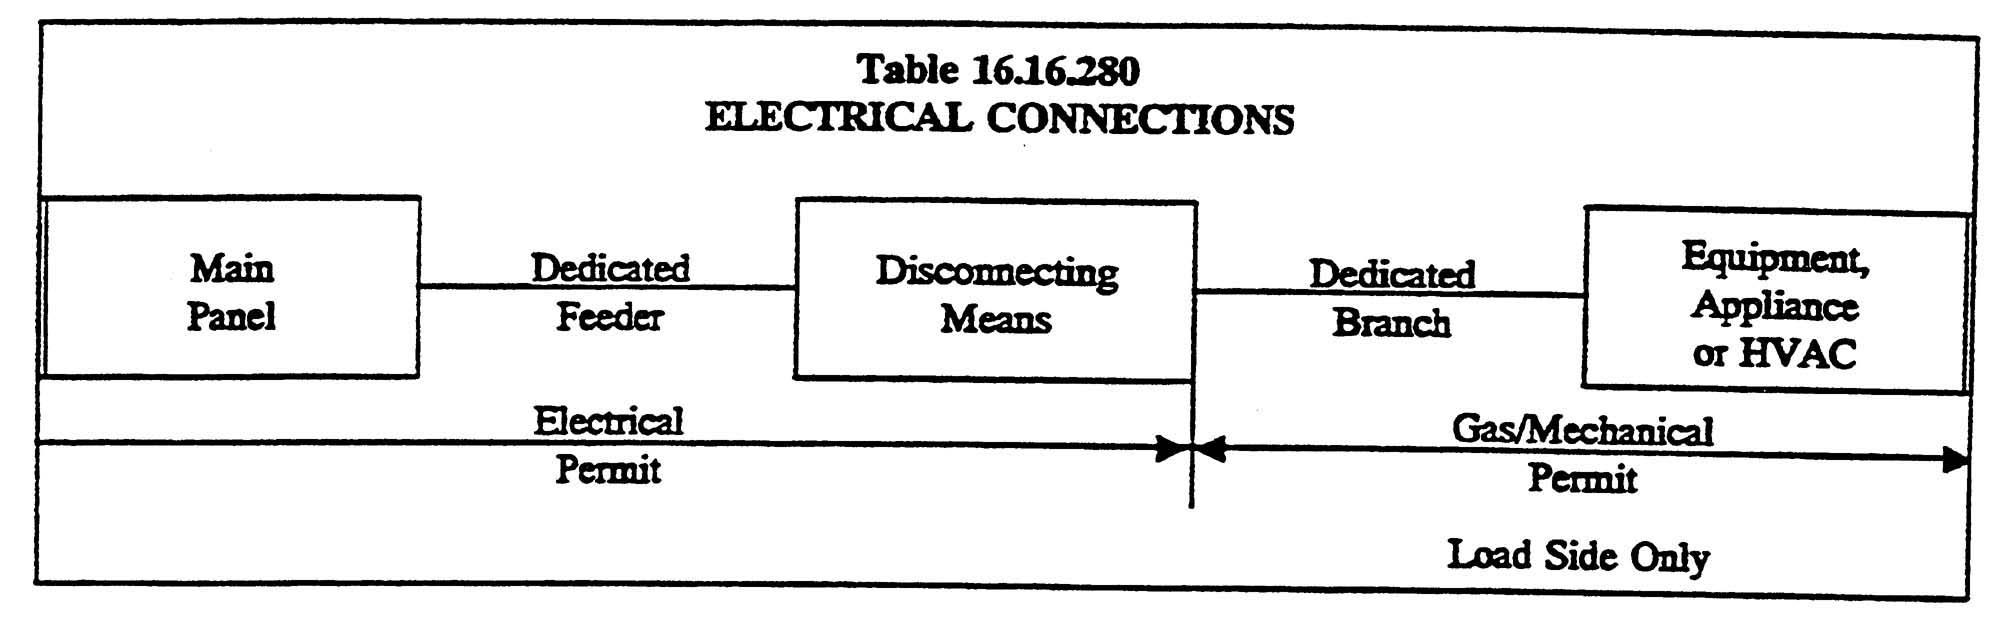 Chapter 16 16 - GAS/MECHANICAL REGULATIONS   Code of